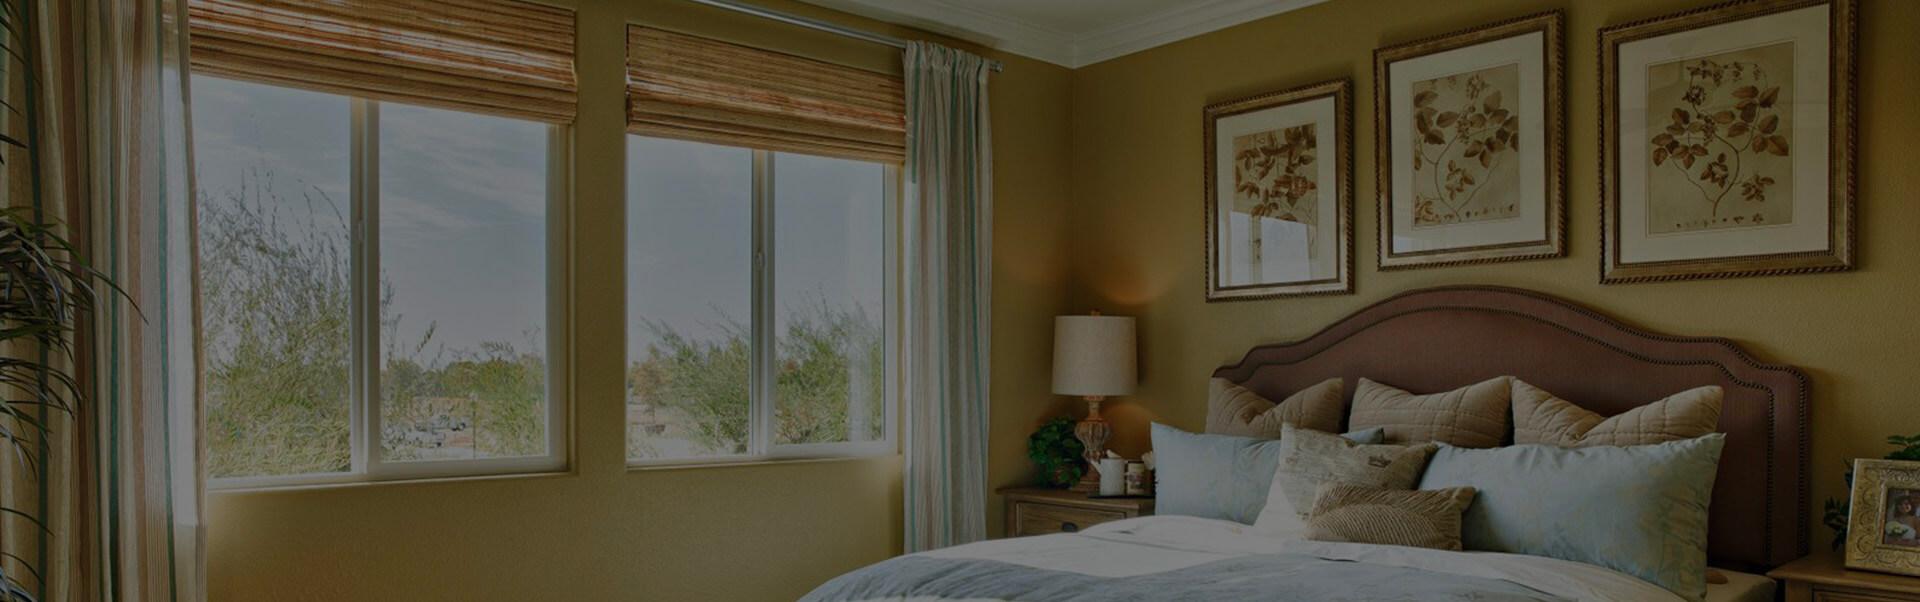 sliding windows in a bedroom